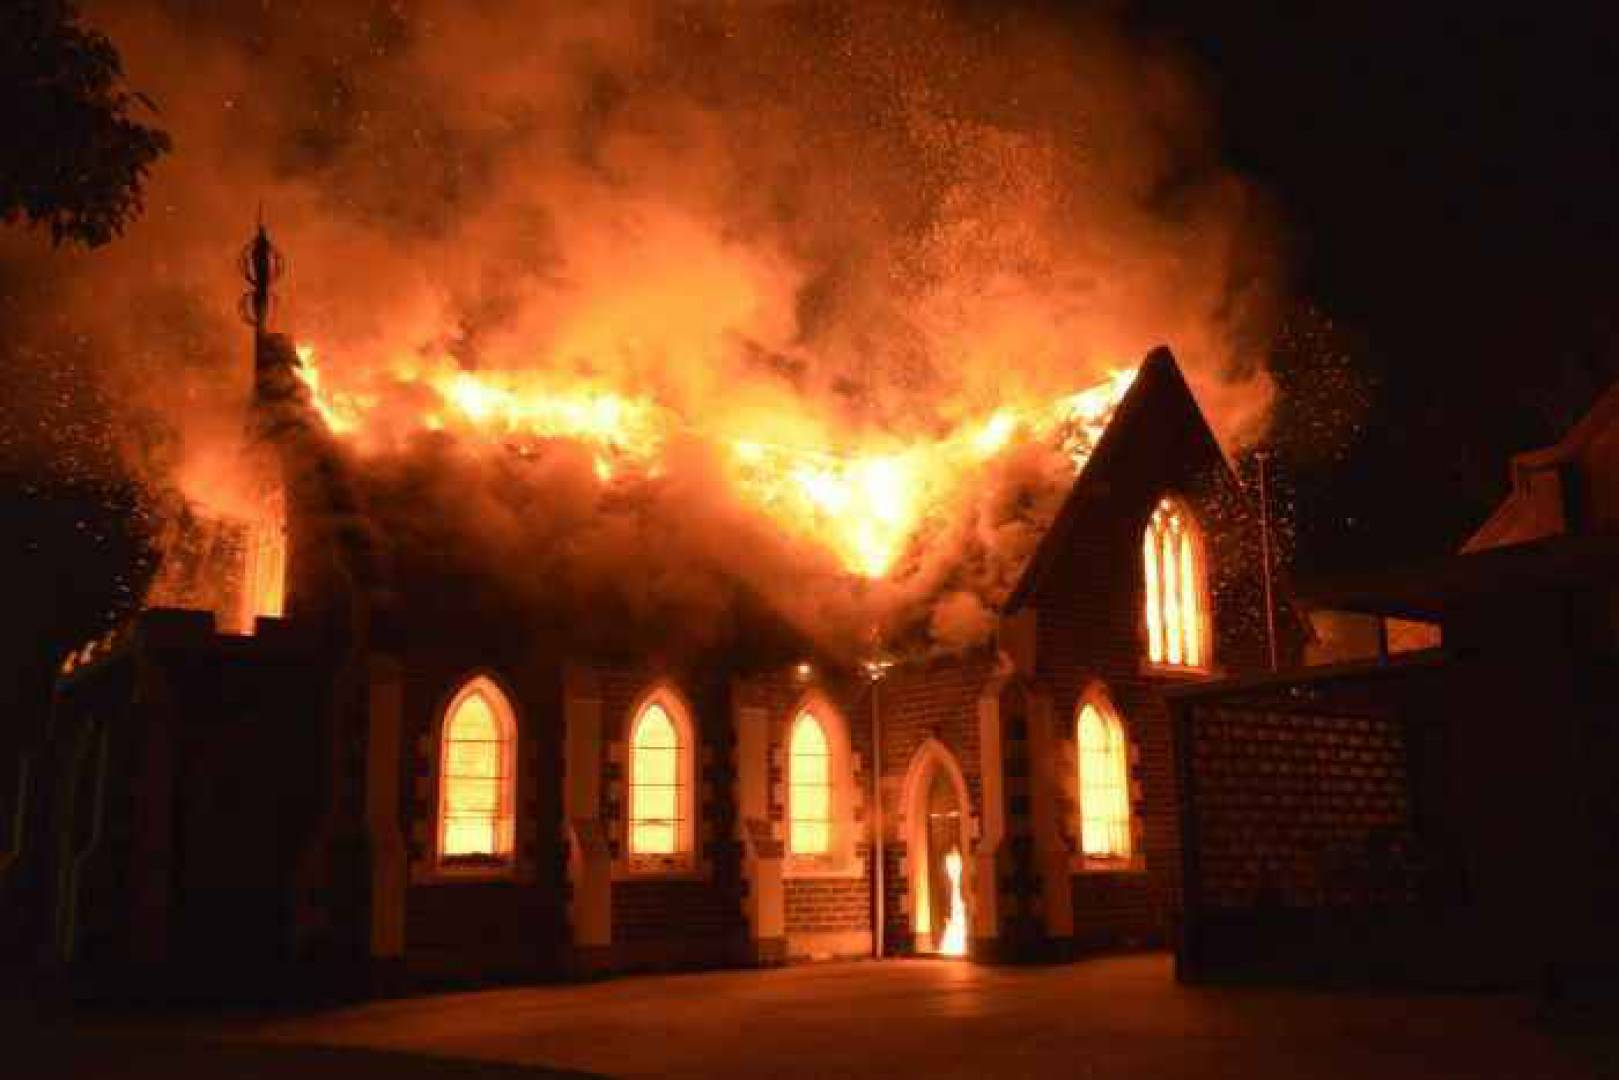 Ashby uniting church former churches australia for The ashby